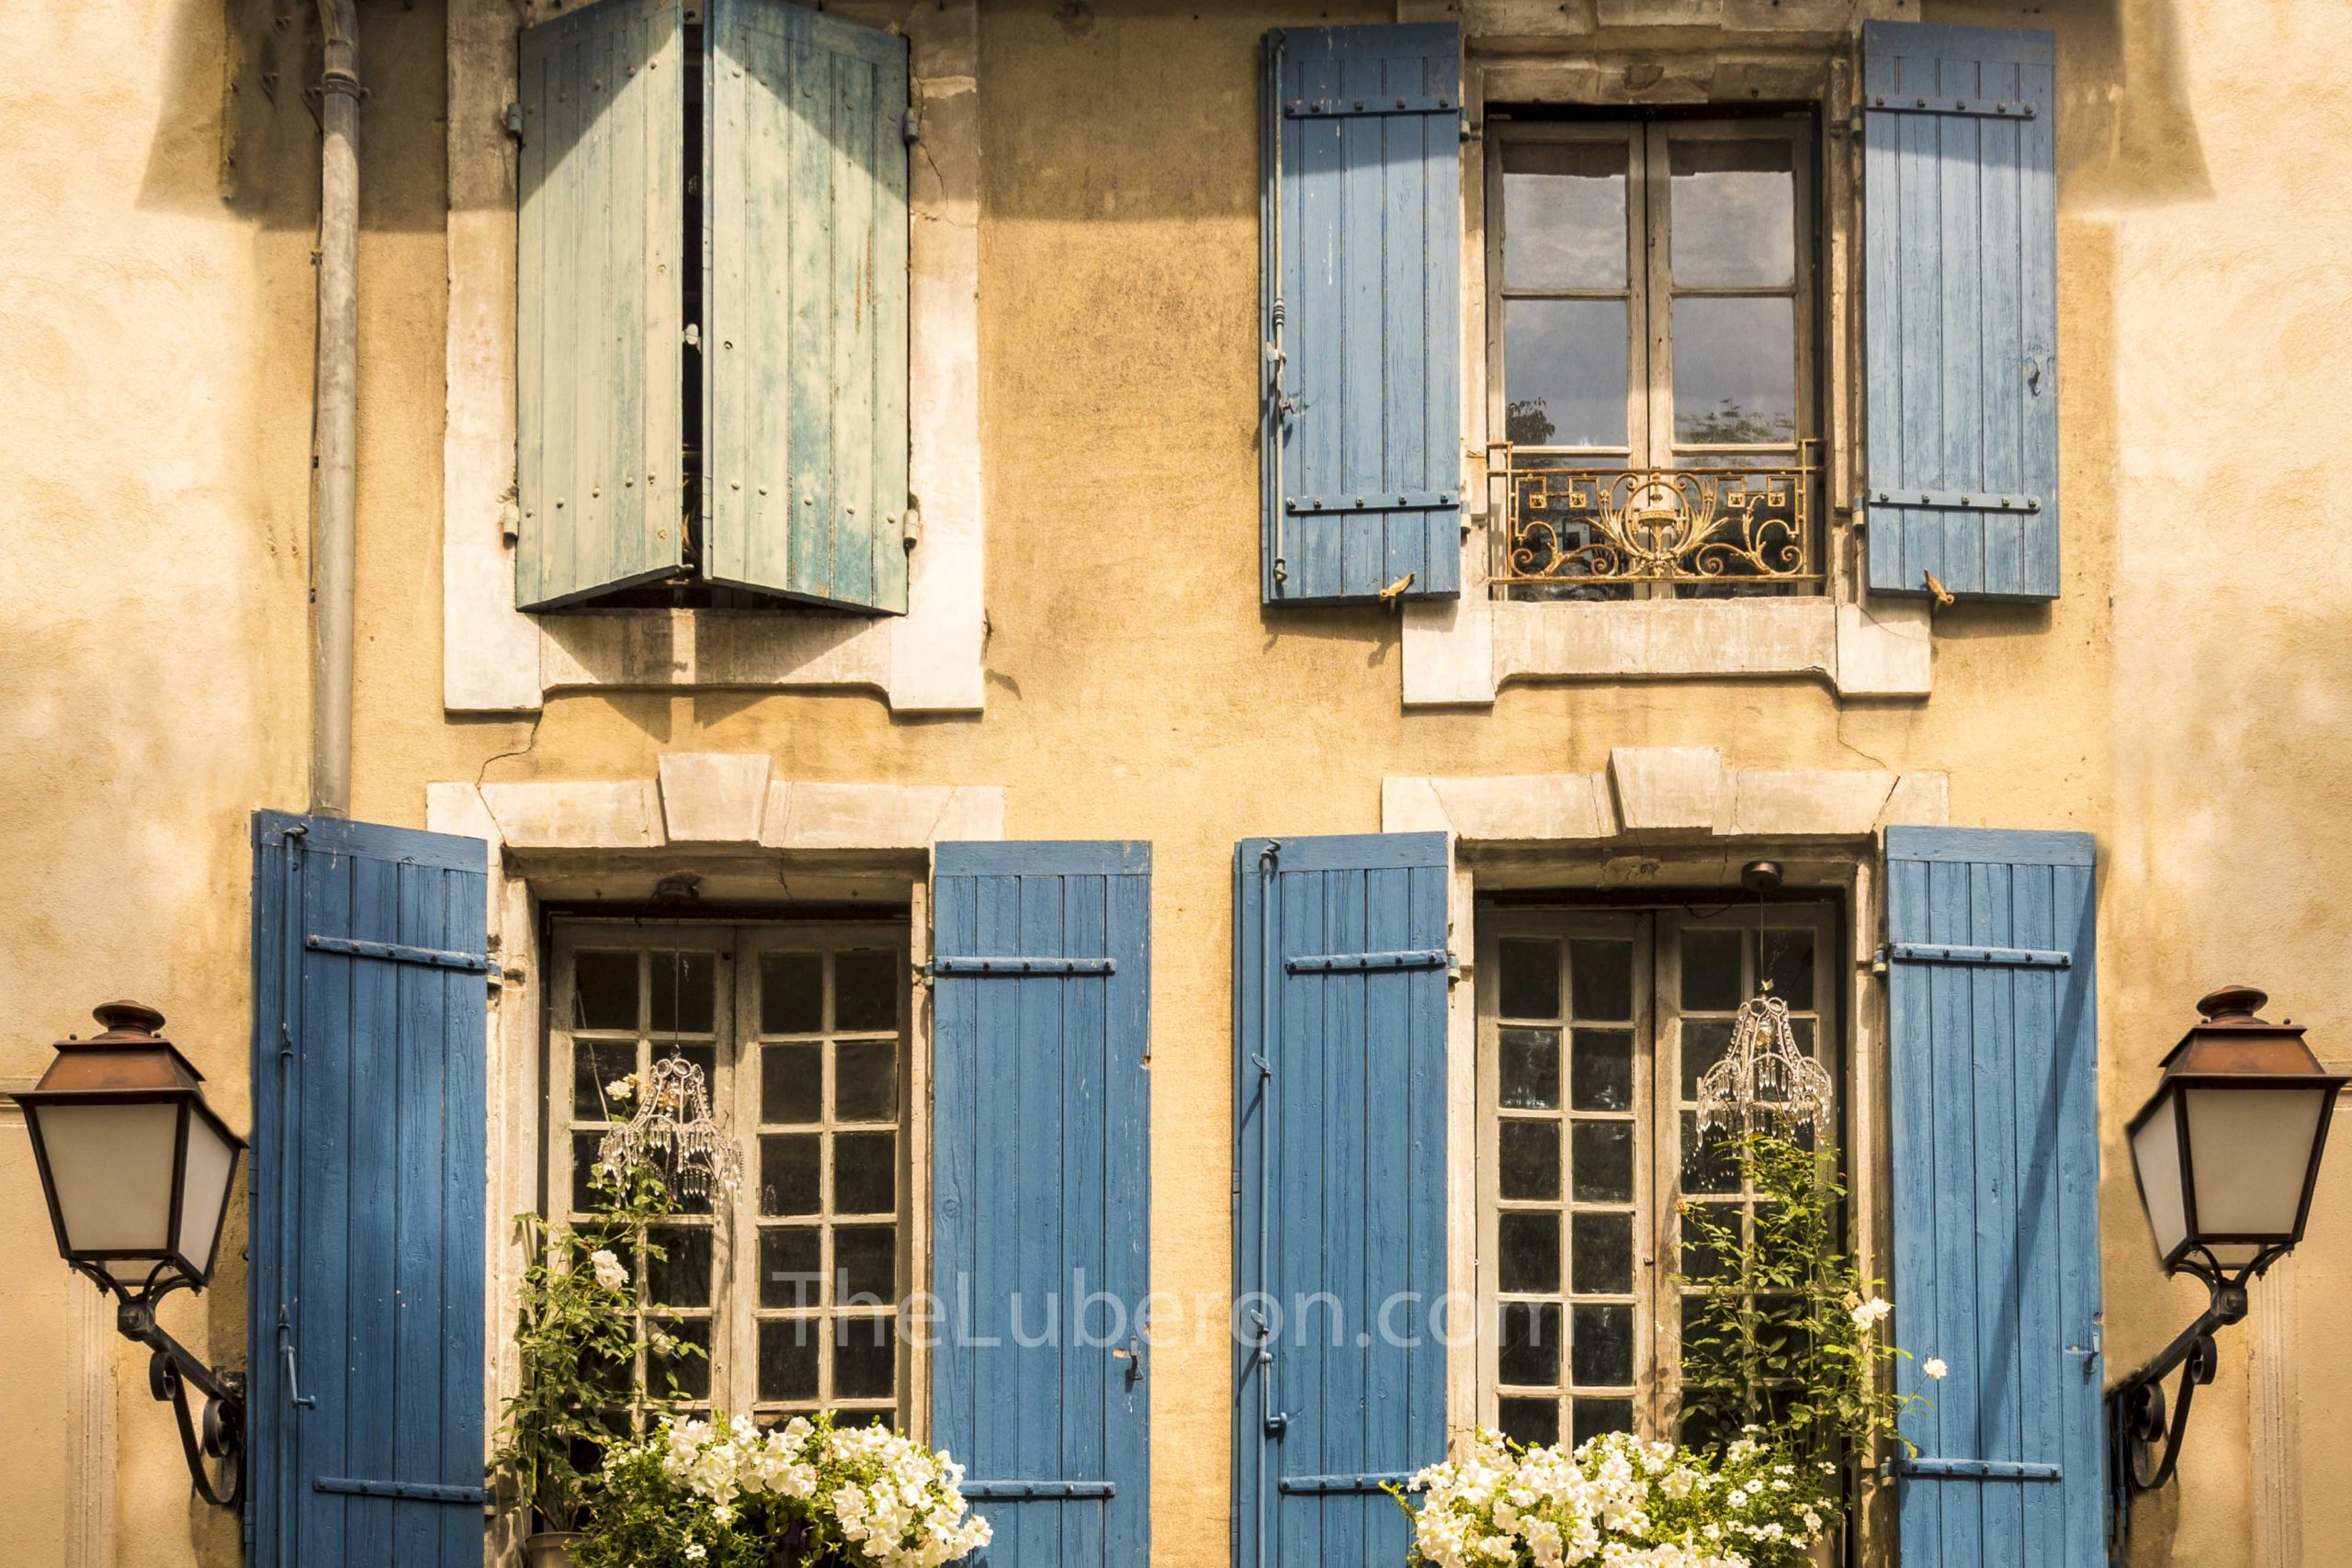 Shutters in St-Remy-de-Provence